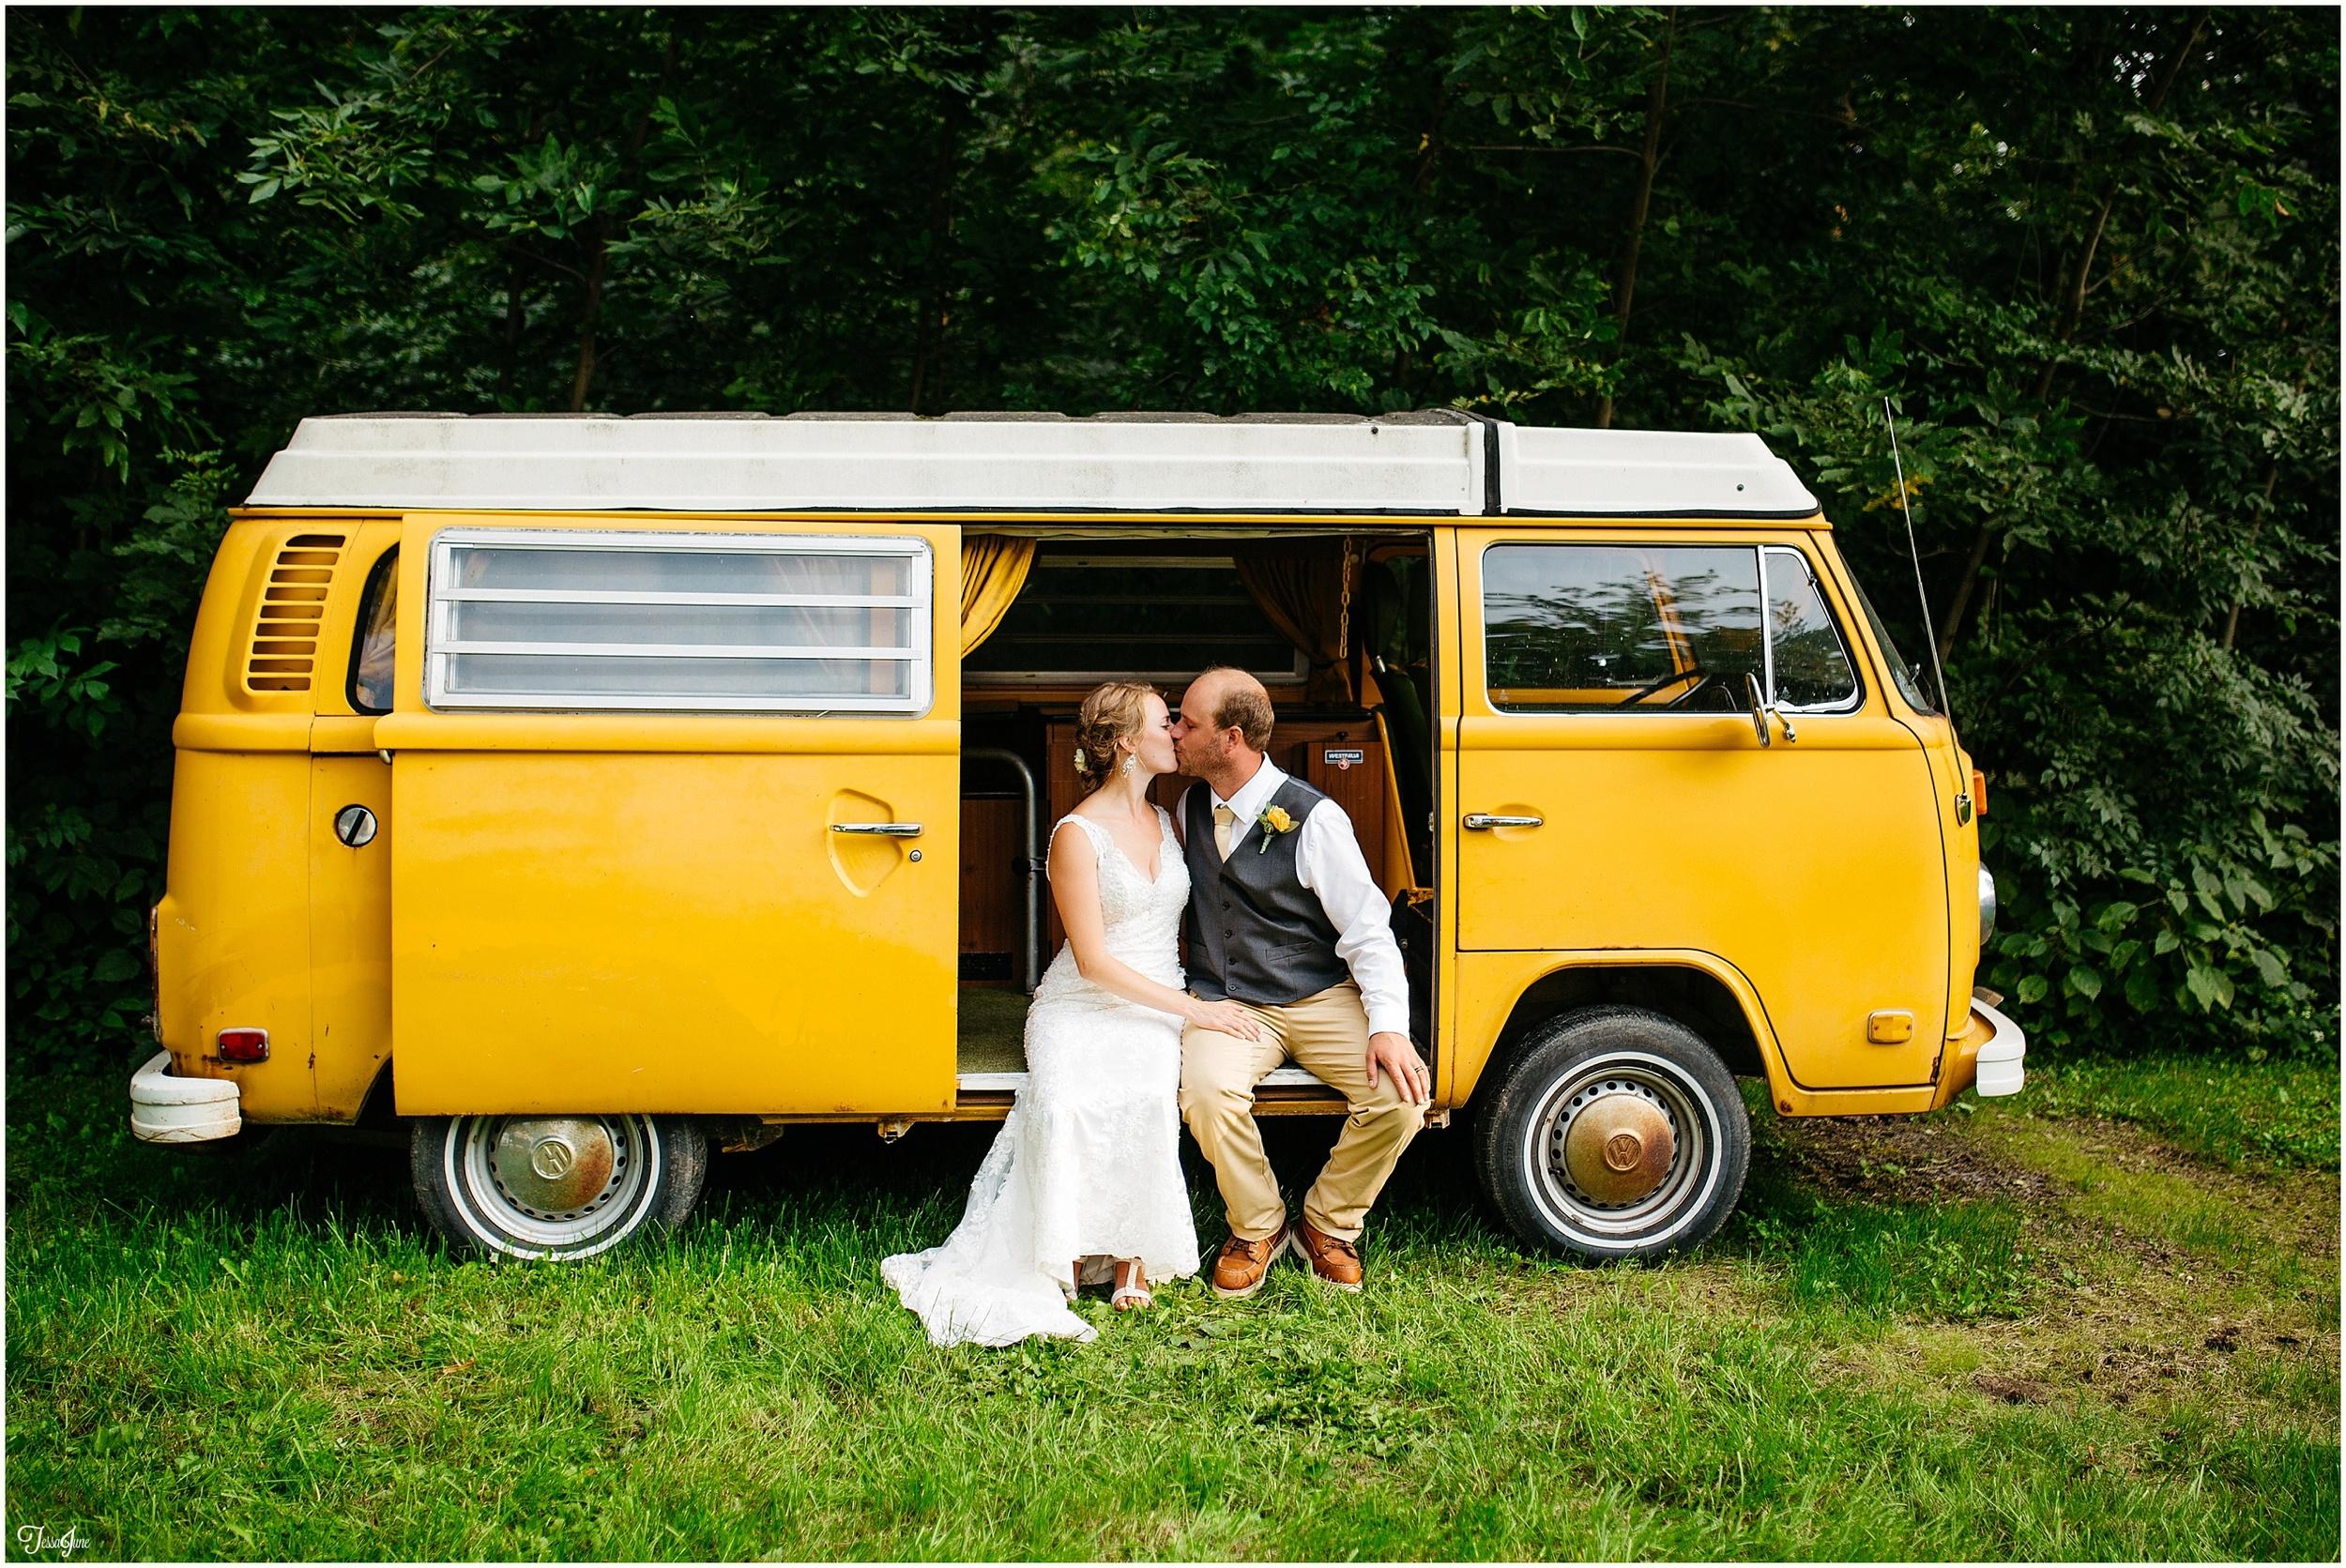 rochester-saint-cloud-minnesota-bohemian-hippie-wedding-orange-bridesmaids-redwing-boots-yellow-volkswagen-van